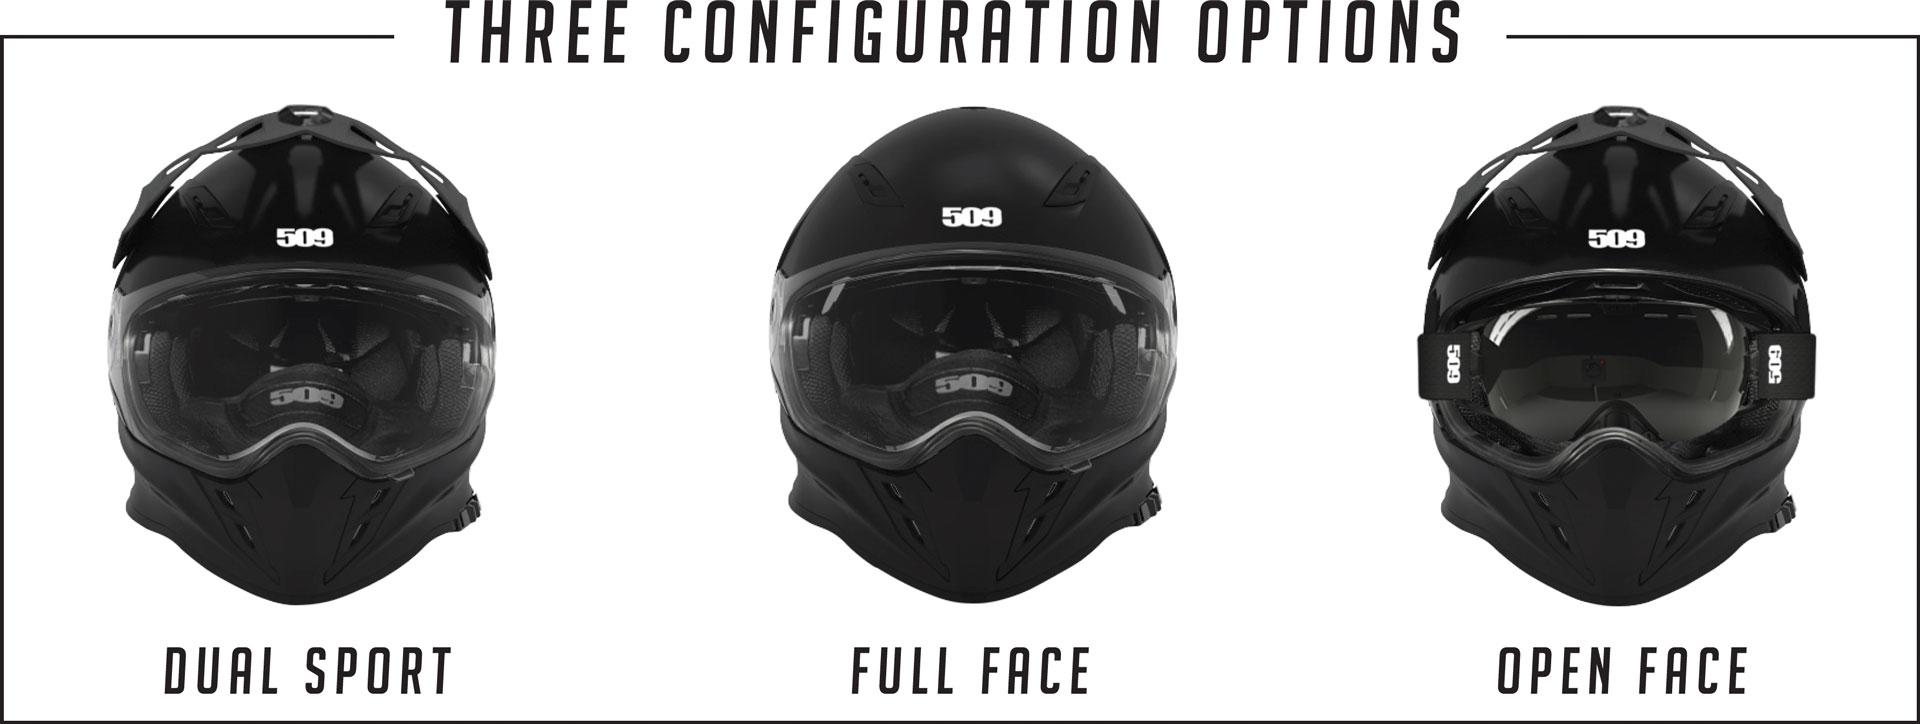 509 Delta R3 Offroad Helmet